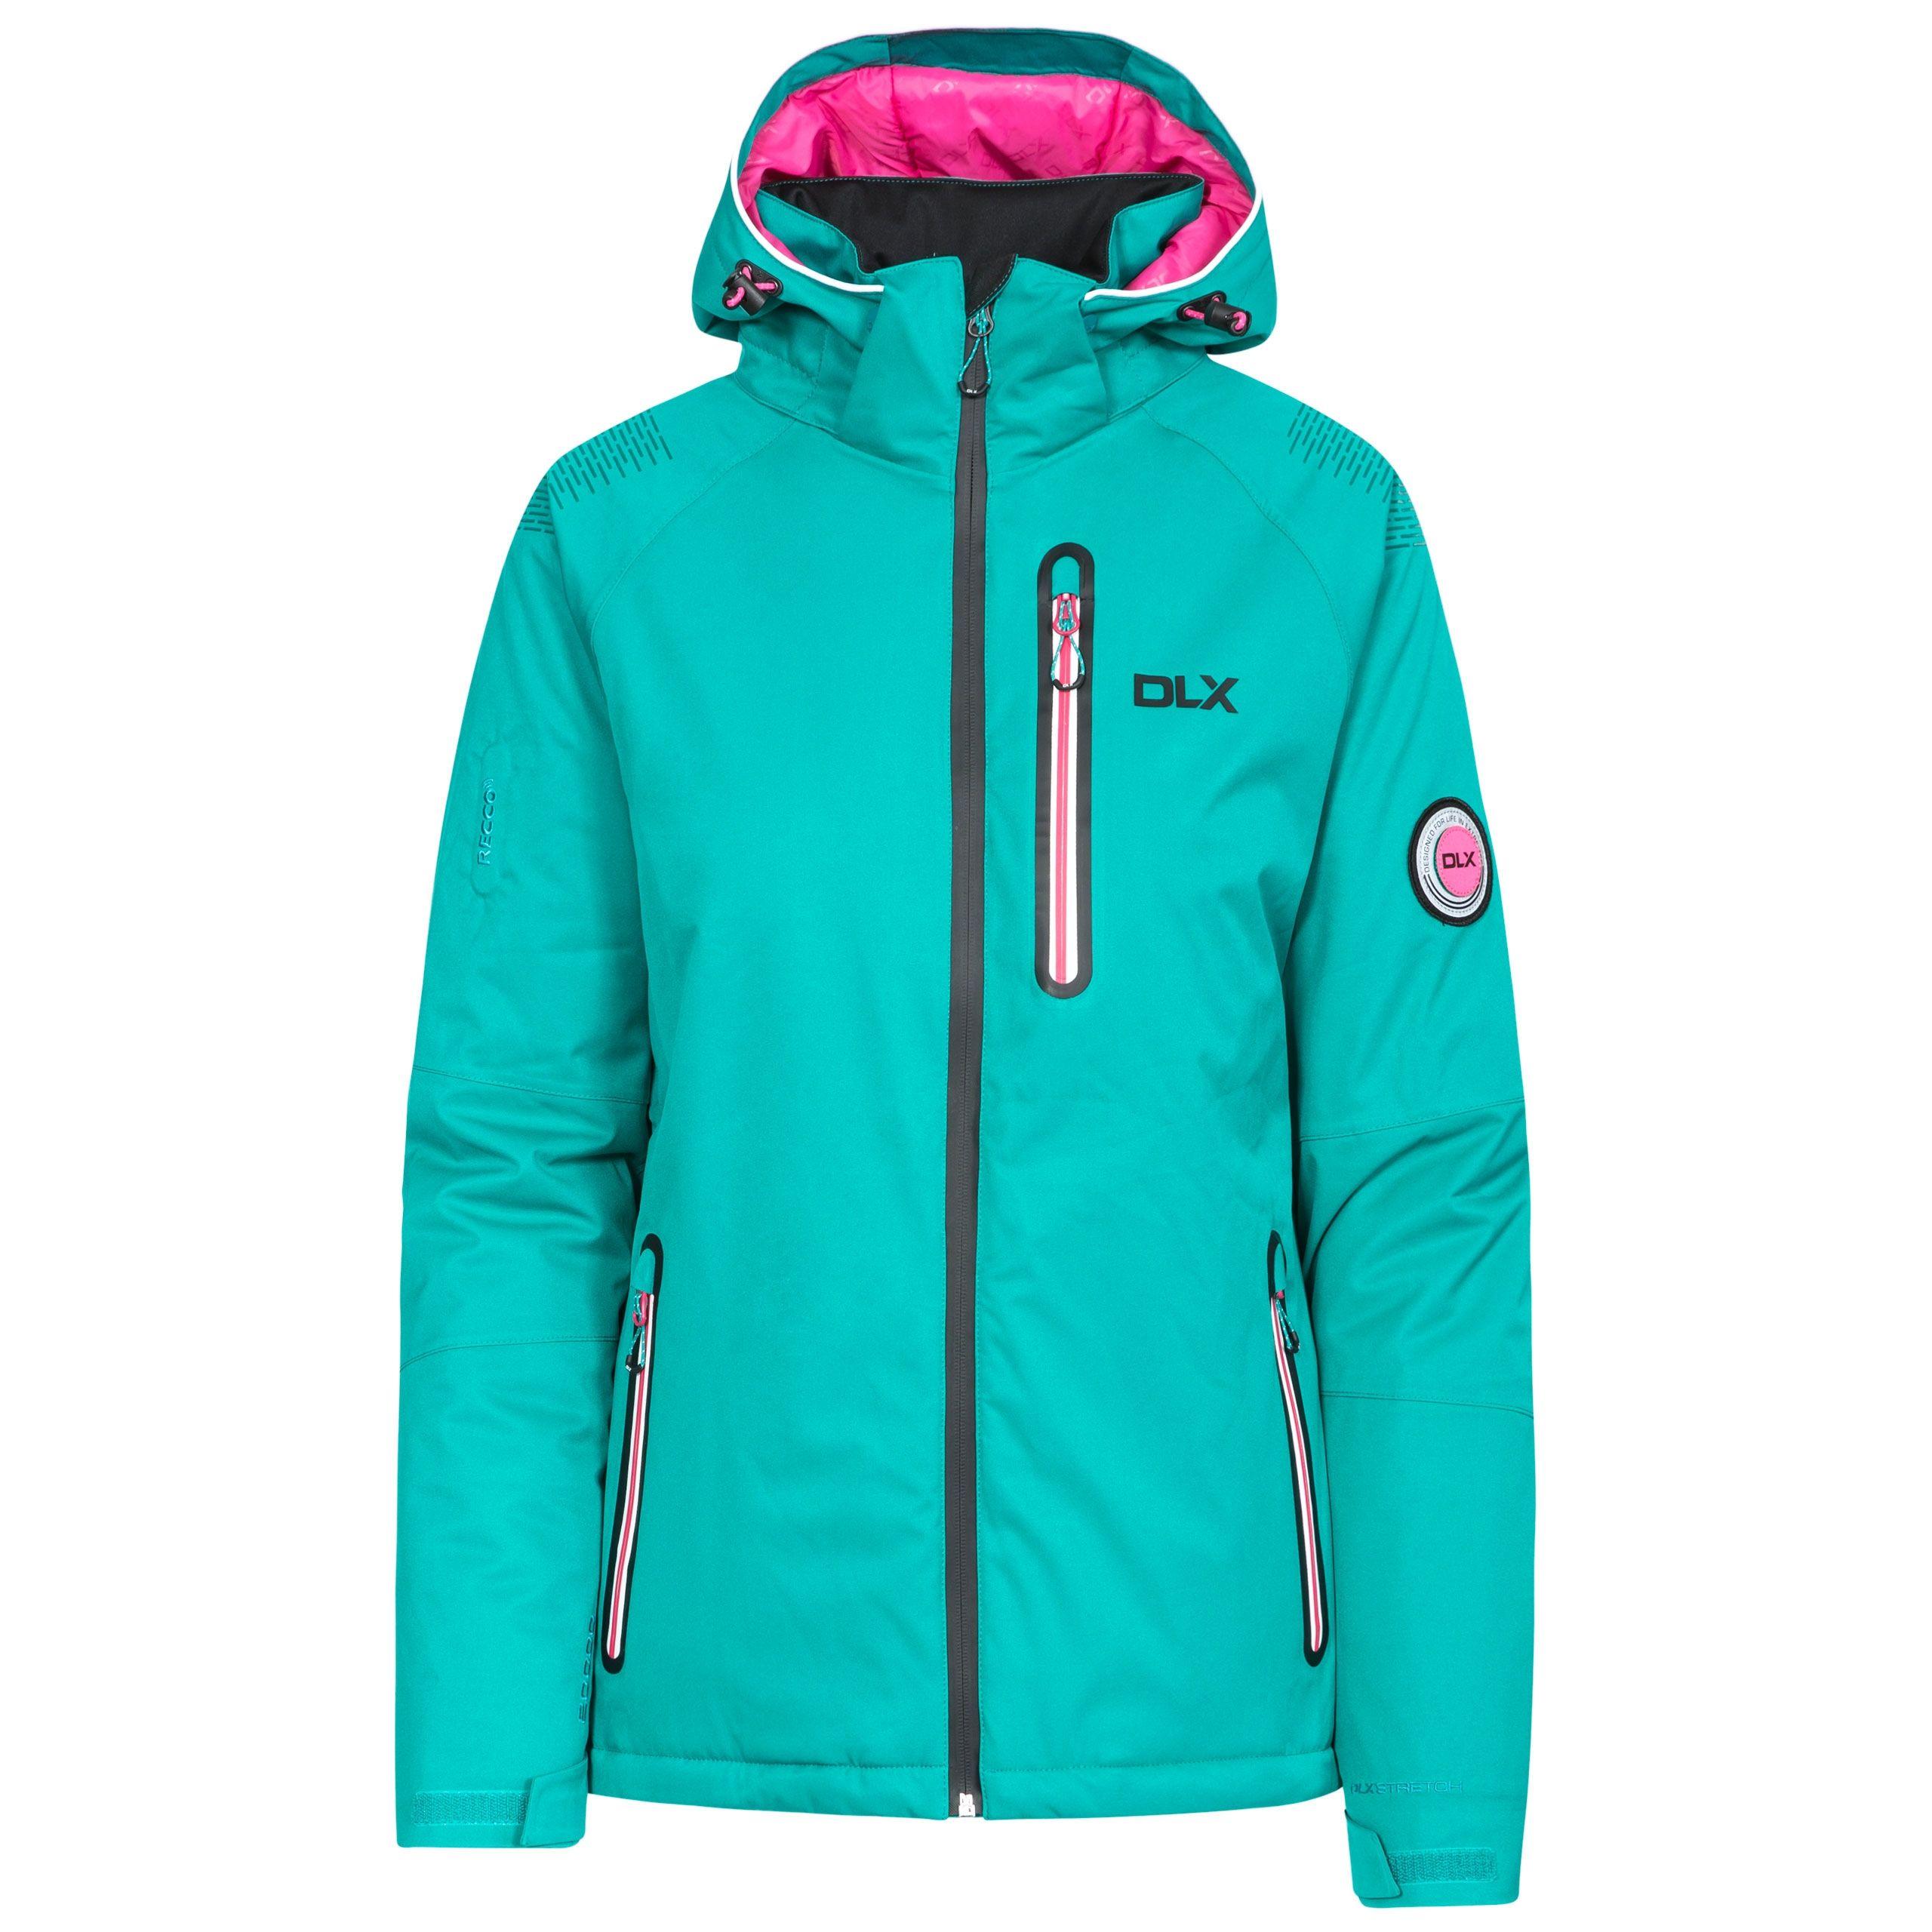 Nicolette Womens Dlx Hi Tech Ski Jacket